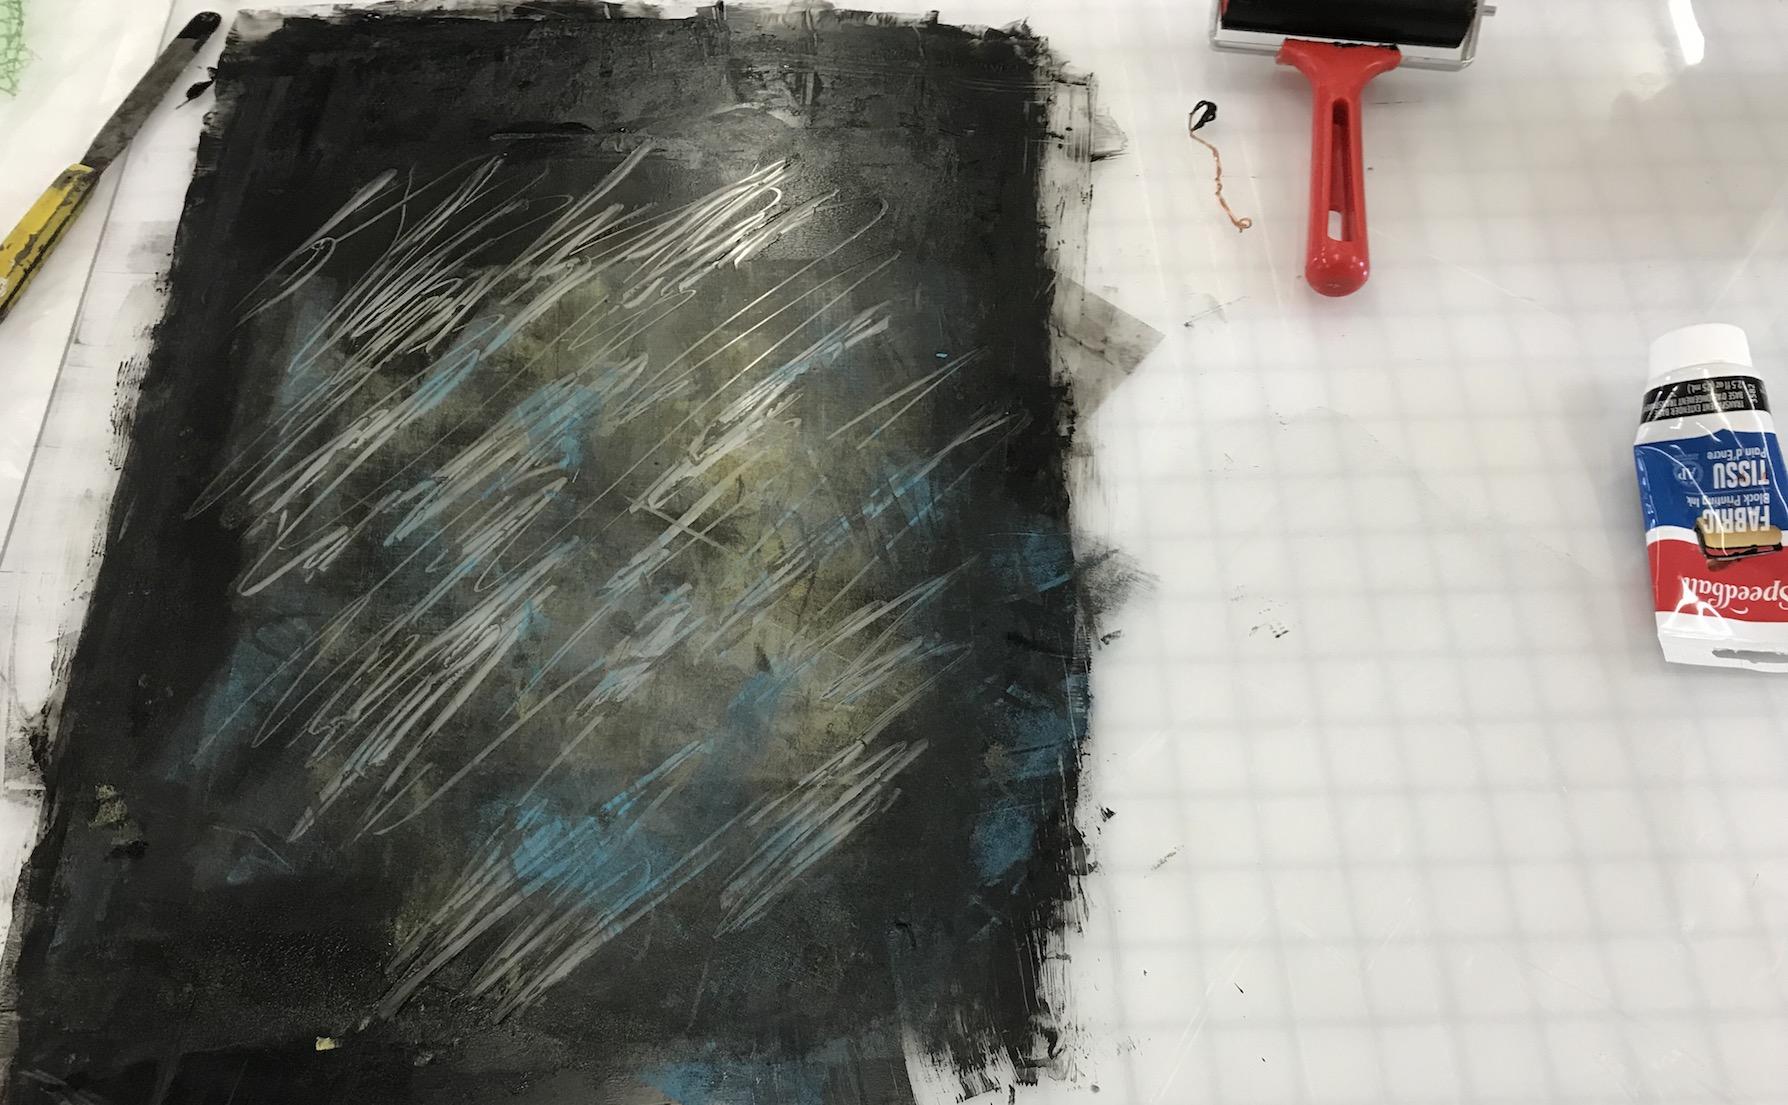 2018-03-15_14-37-30_271